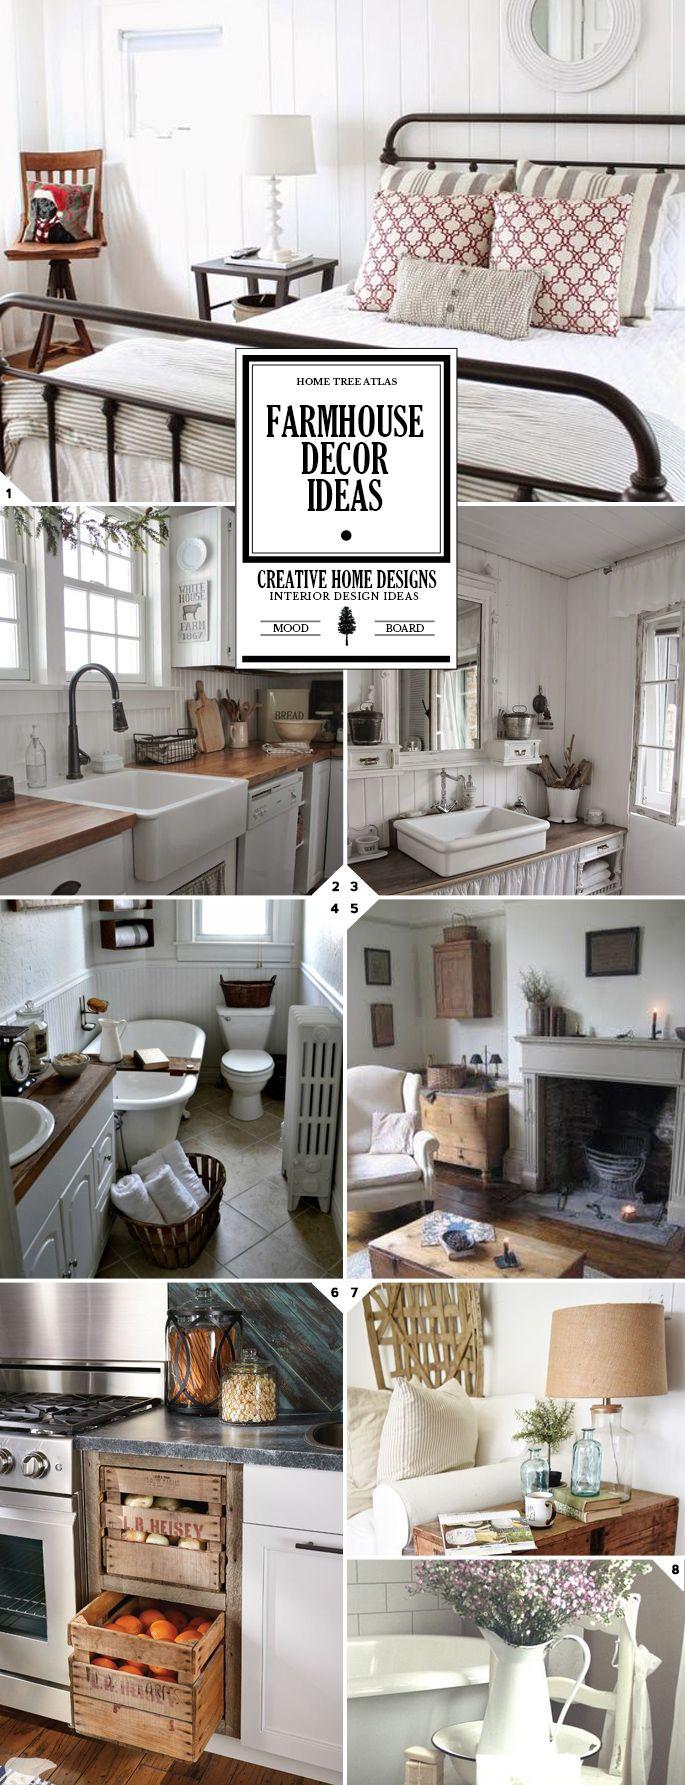 vintage and rustic farmhouse decor ideas design guide decor ideas. Black Bedroom Furniture Sets. Home Design Ideas